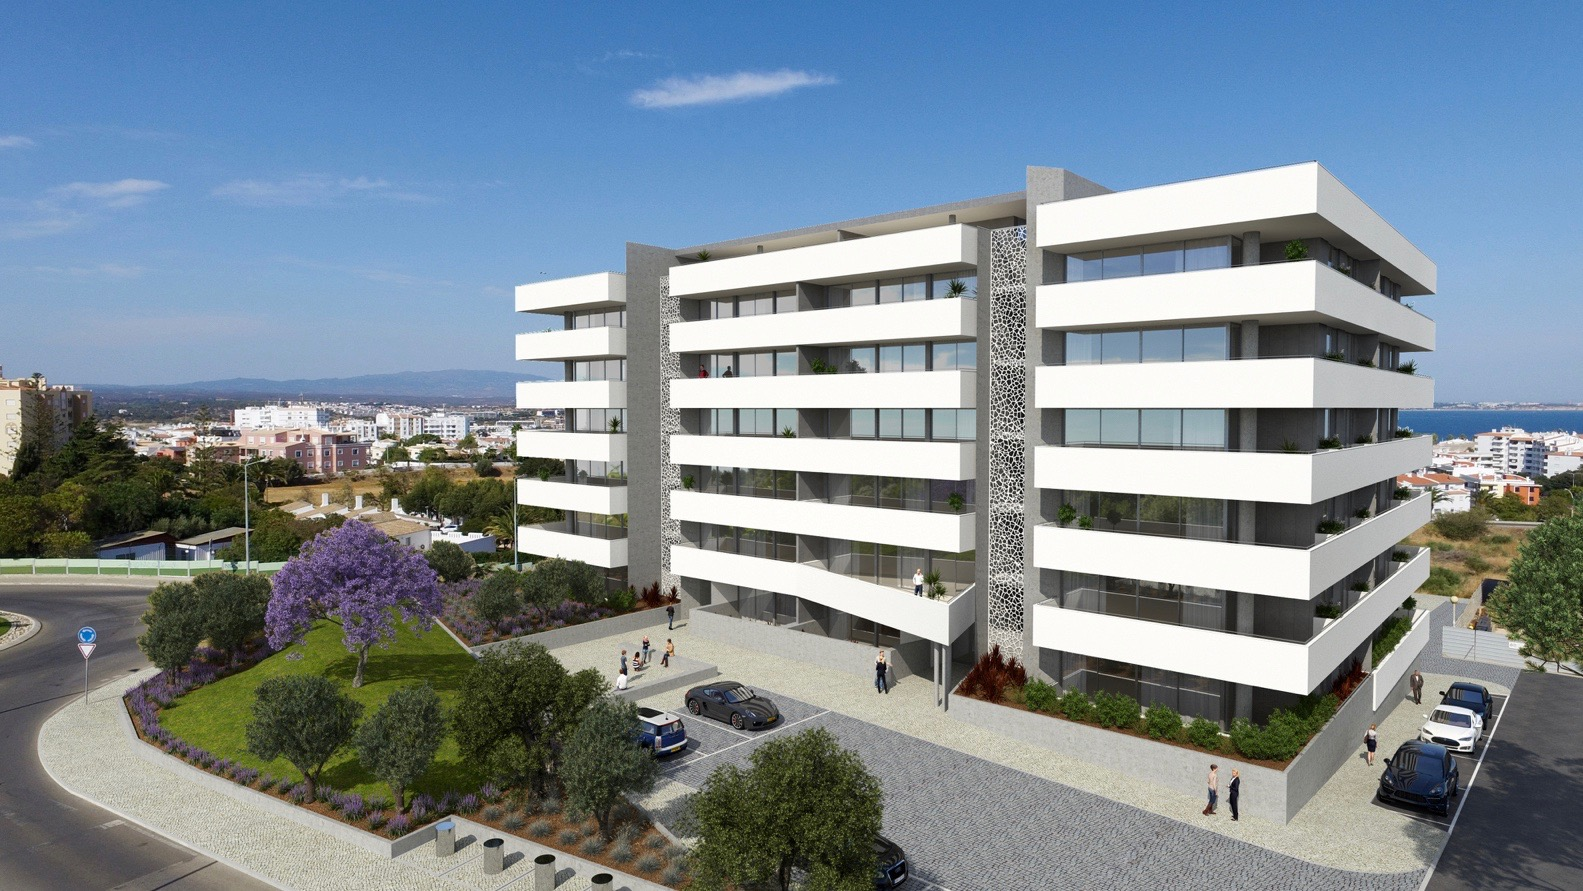 Algarve Luxury 3 bedroom apartment with sea views in Lagos  - Lagos